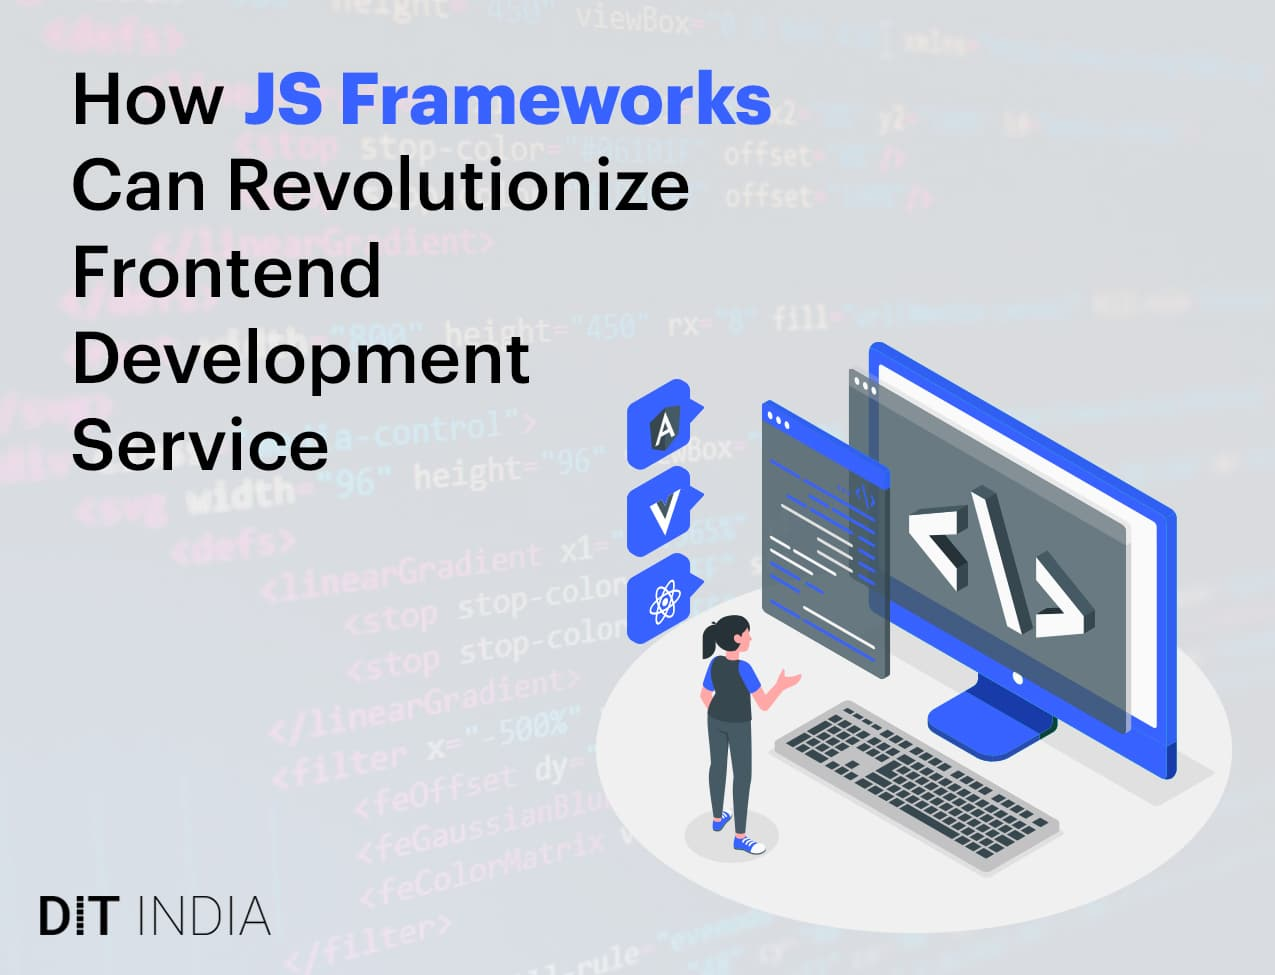 How-JS-Frameworks-Can-Revolutionize-Frontend-Development-Service